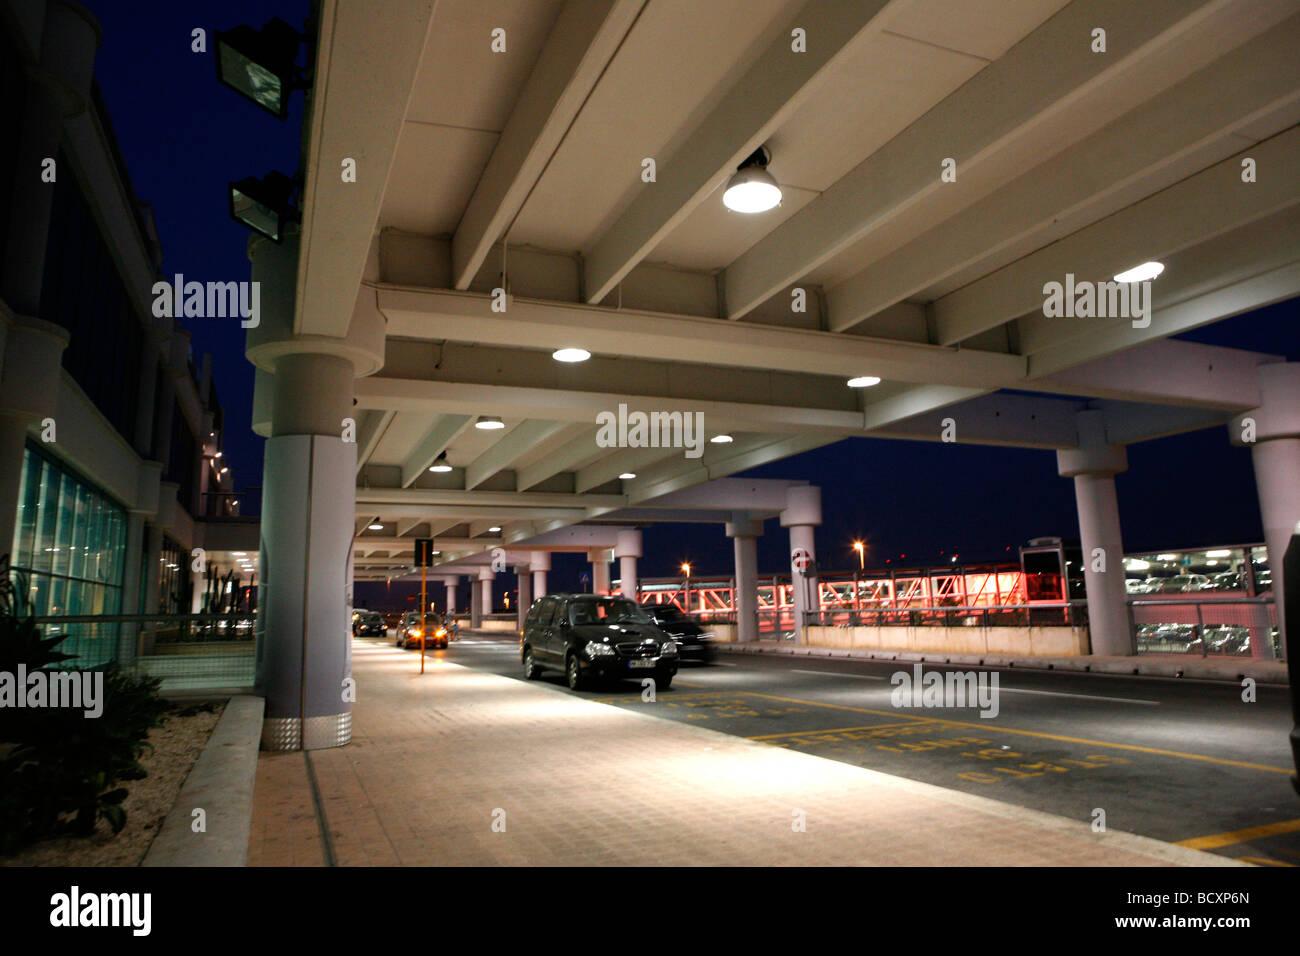 Aeroporto Bari : Aeroporto di bari palese karol wojtyla stock photos aeroporto di